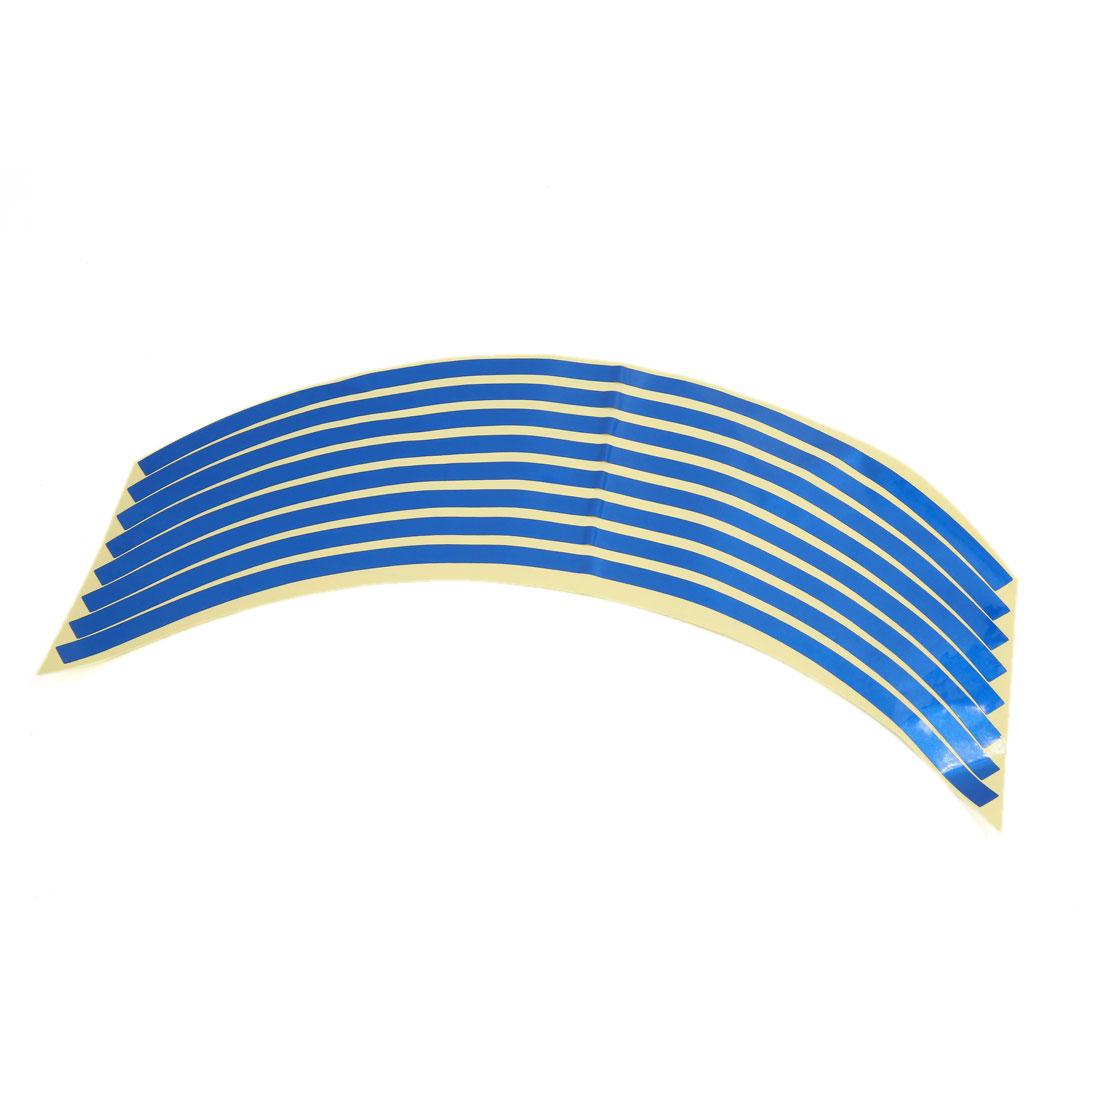 10pcs 32cm x 0.8cm Sticky Vinyl Decorative Sticker Decal Strip Blue for Car Auto